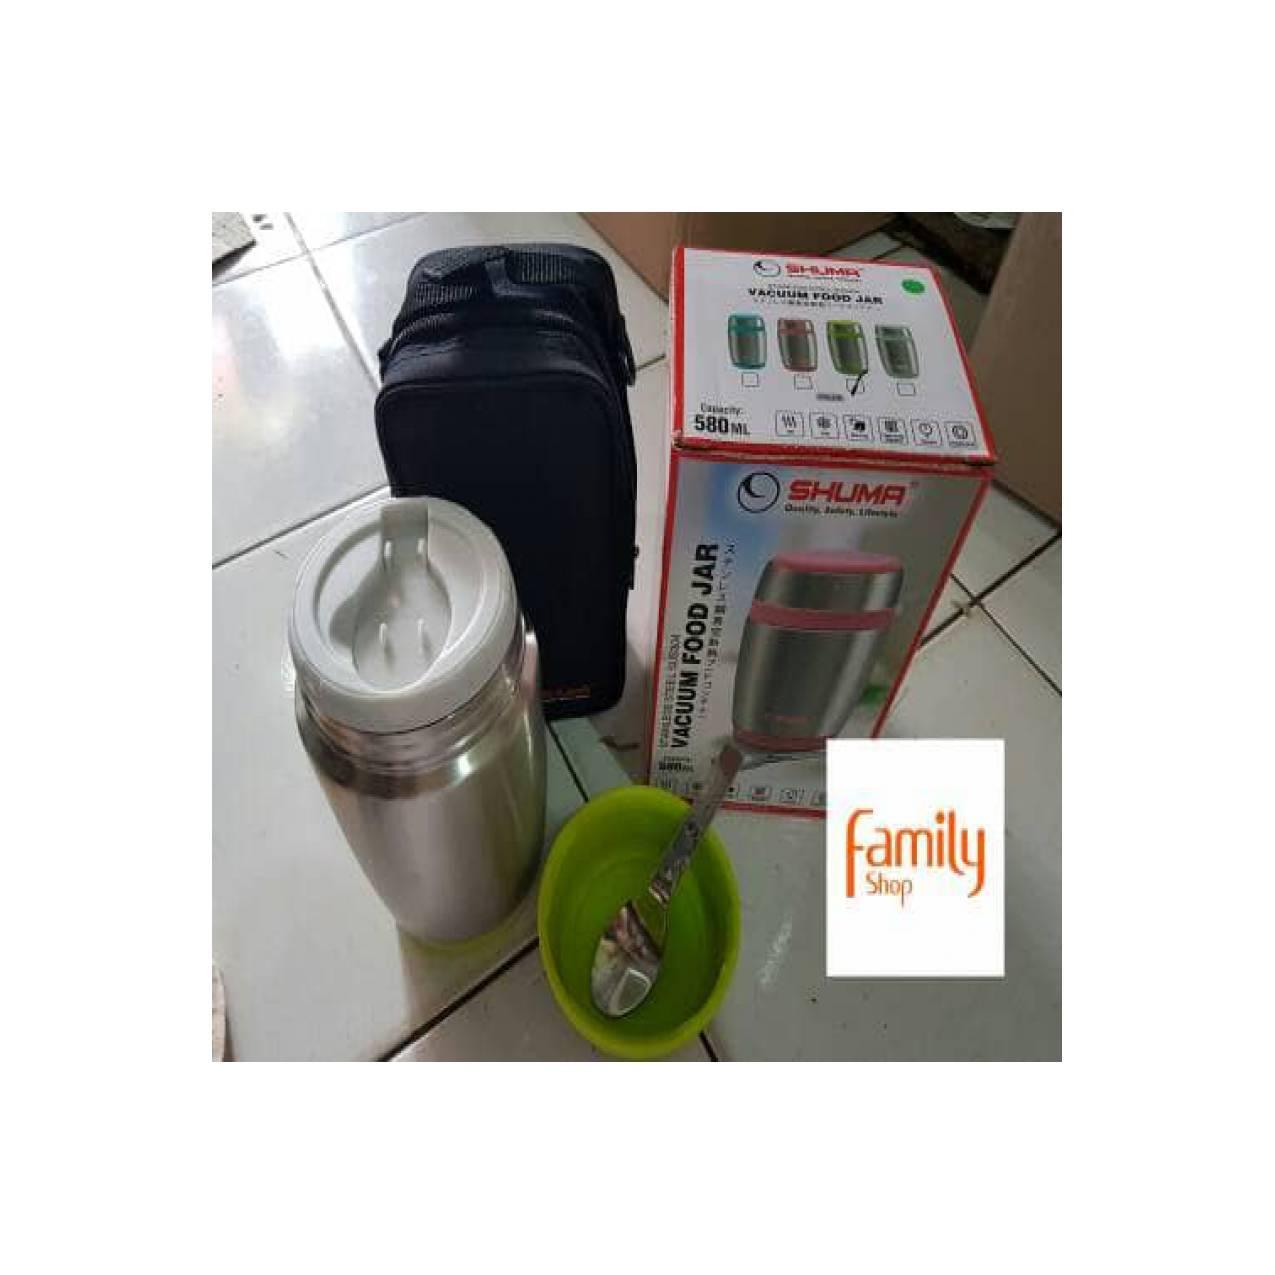 150 Buah Tahan Api Isolasi Selongsong Kabel Sleeving Kemas Mengatur Heat Shrink Tube 03 Cm Solatip Bakar Selang Rp 313600